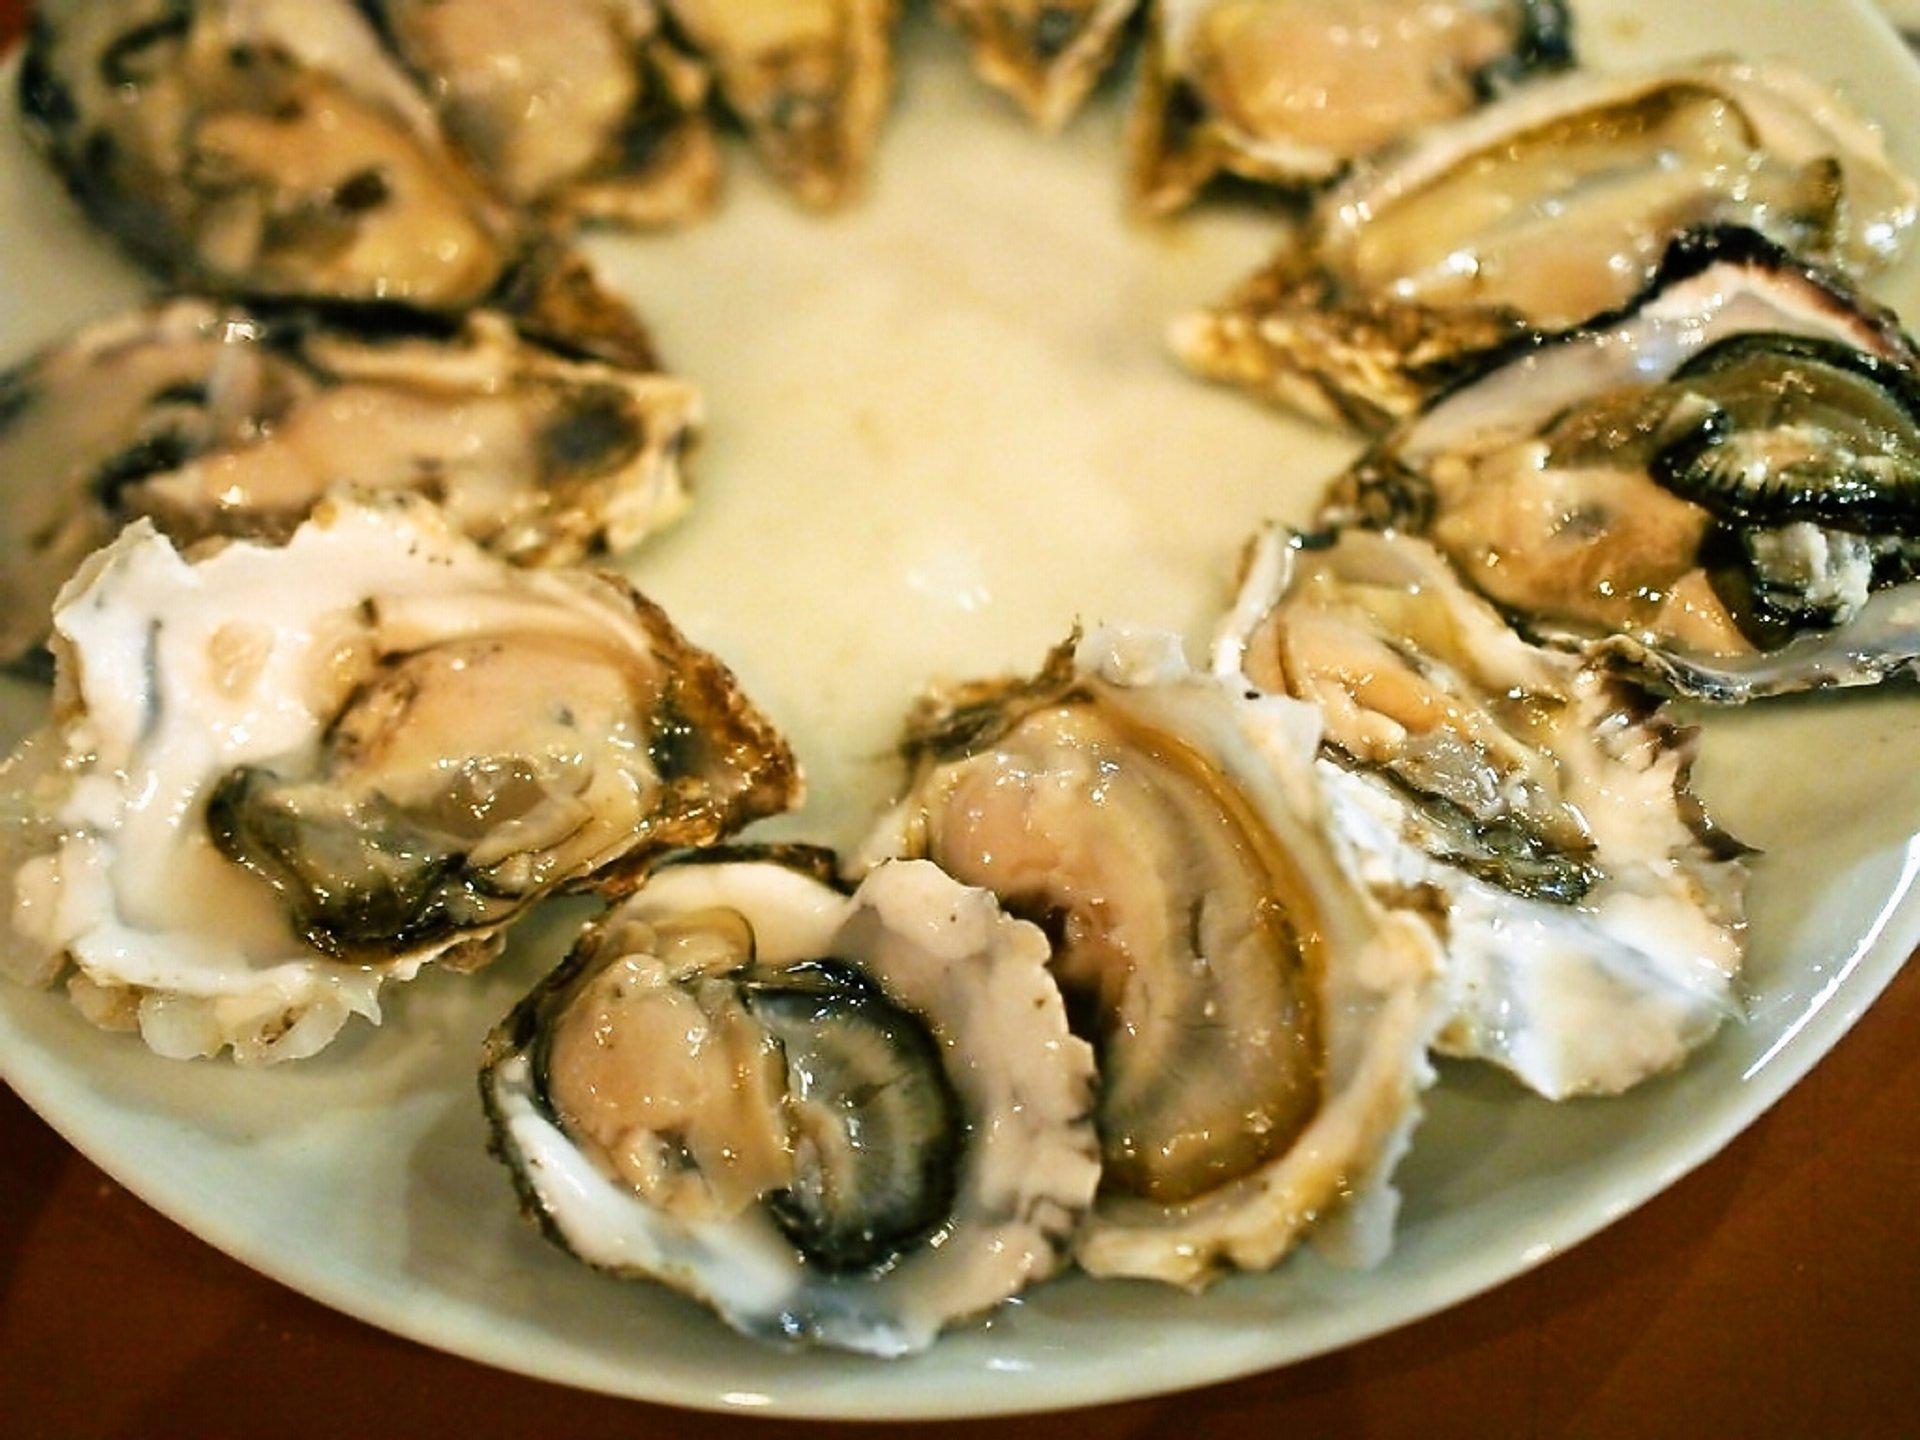 Oysters Harvest in Phuket Season in Thailand 2020 - Roveme